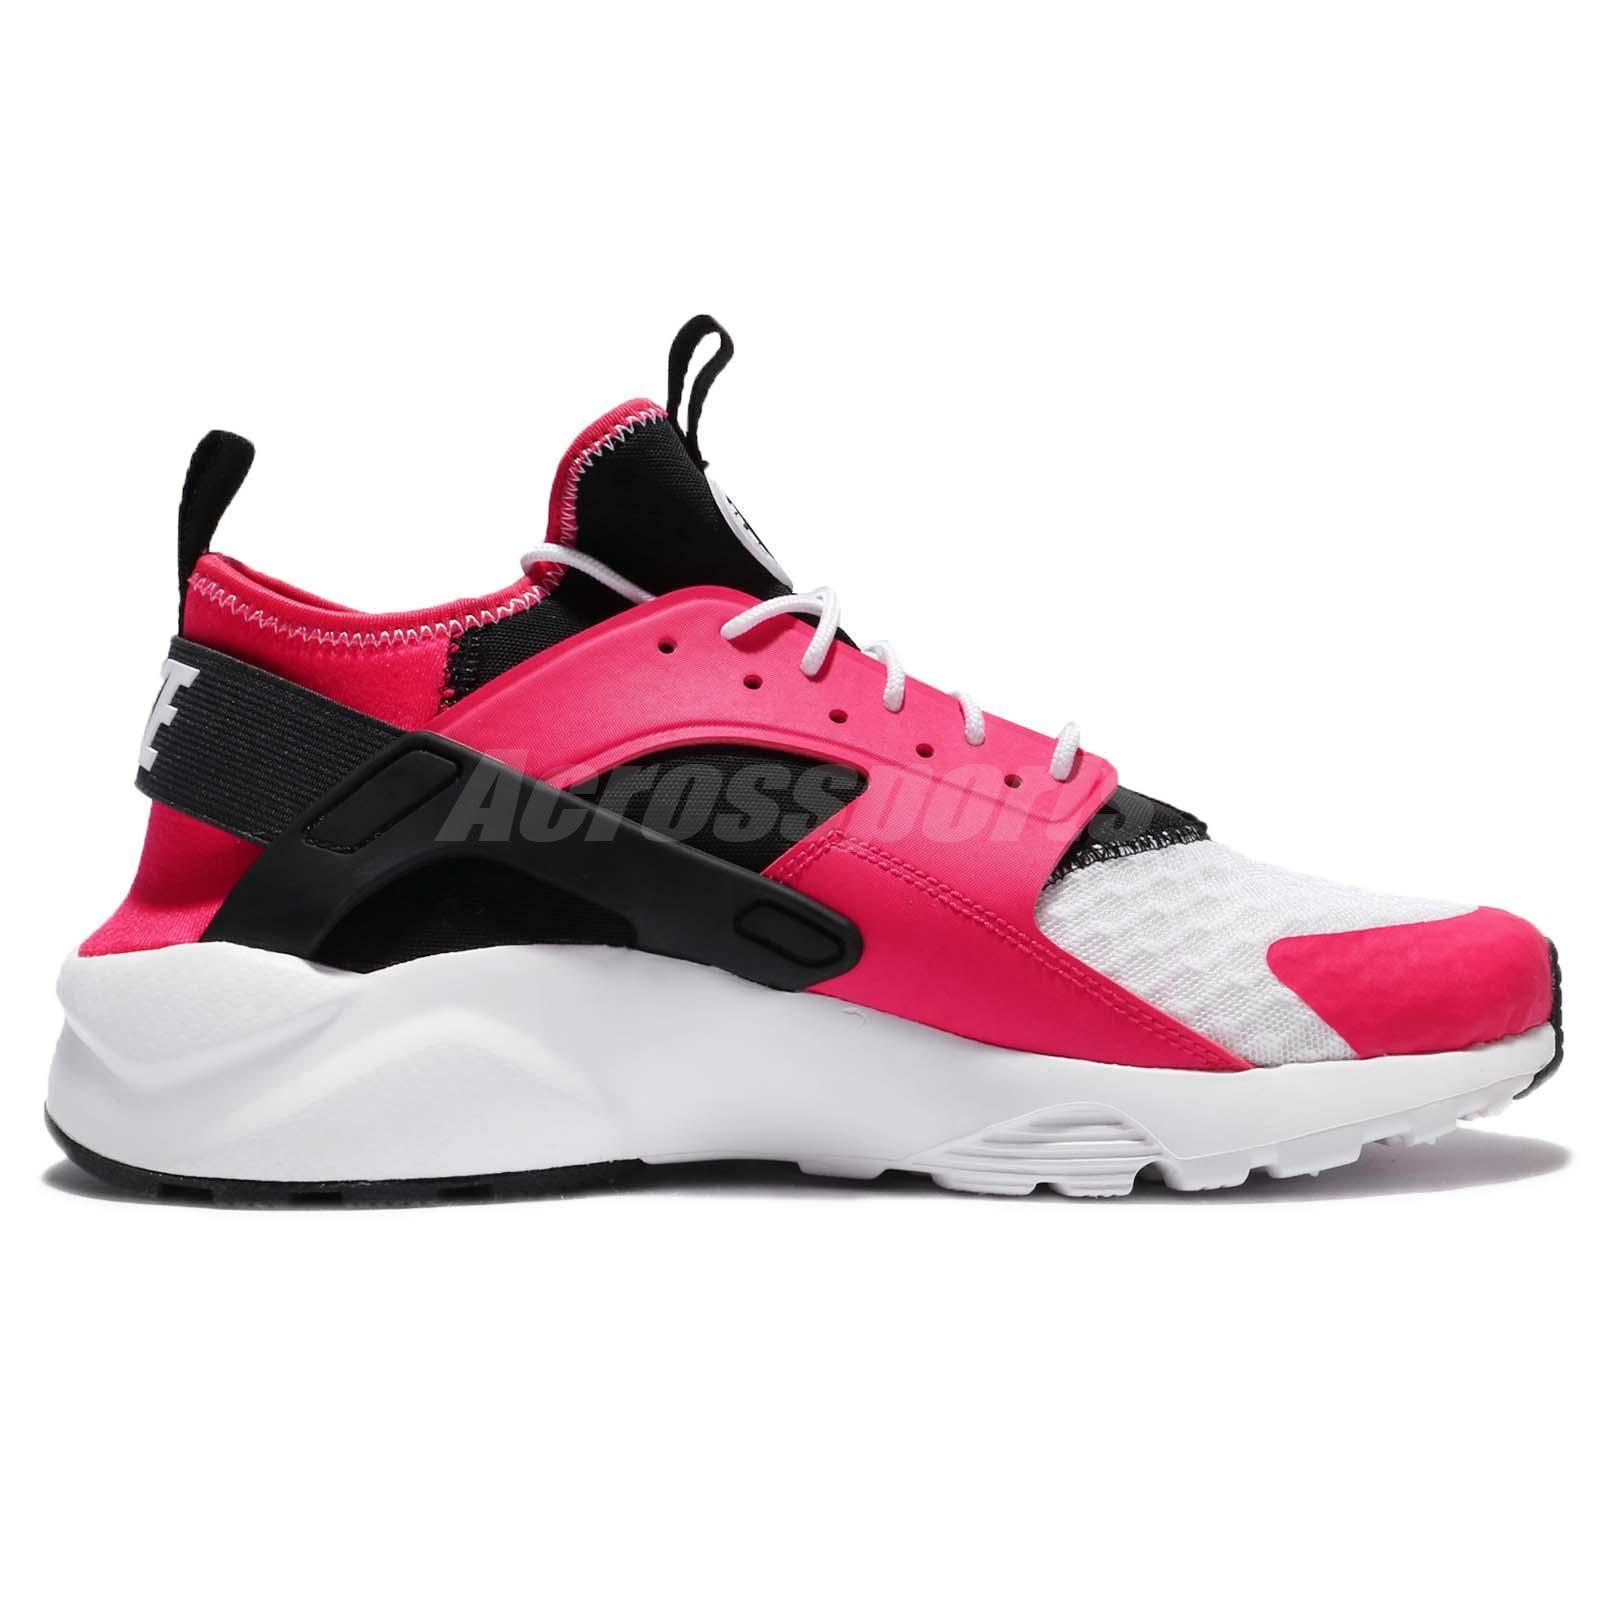 5d03ddc83d01 Nike Air Huarache Run Ultra Siren Red Black White Men Shoes Sneaker ...